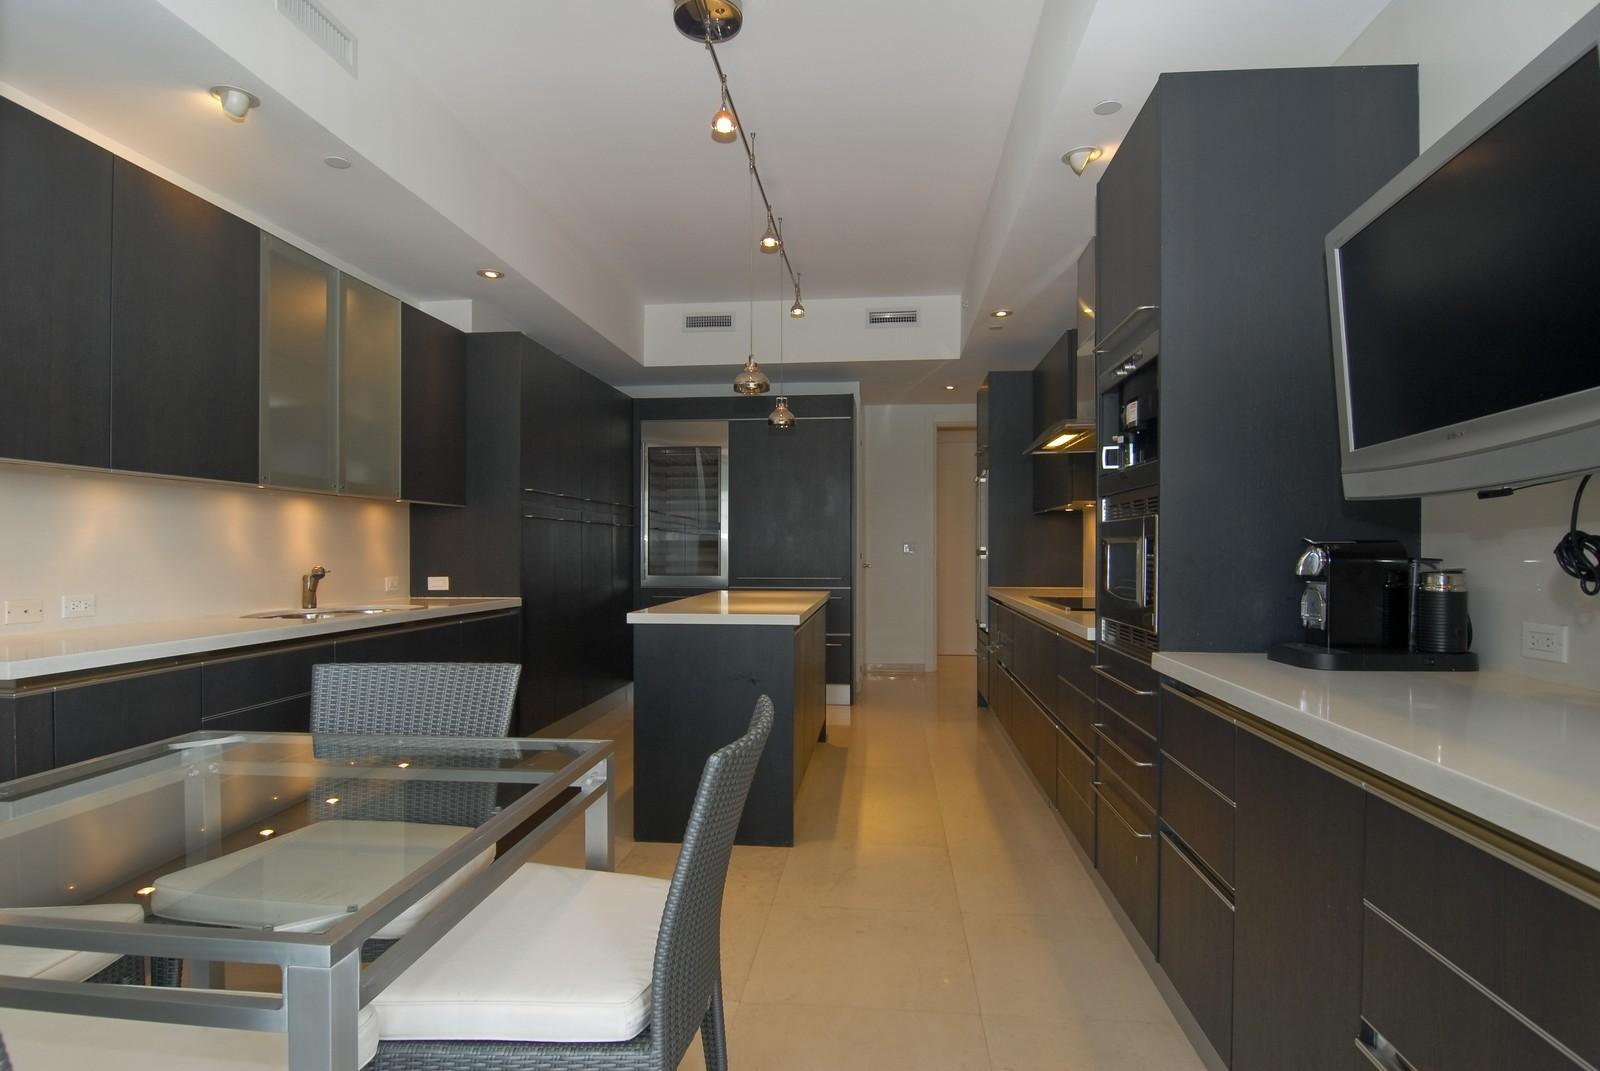 Real Estate Photography - 7161 Fisher Island Drive, Miami Beach, FL, 33109 - Kitchen